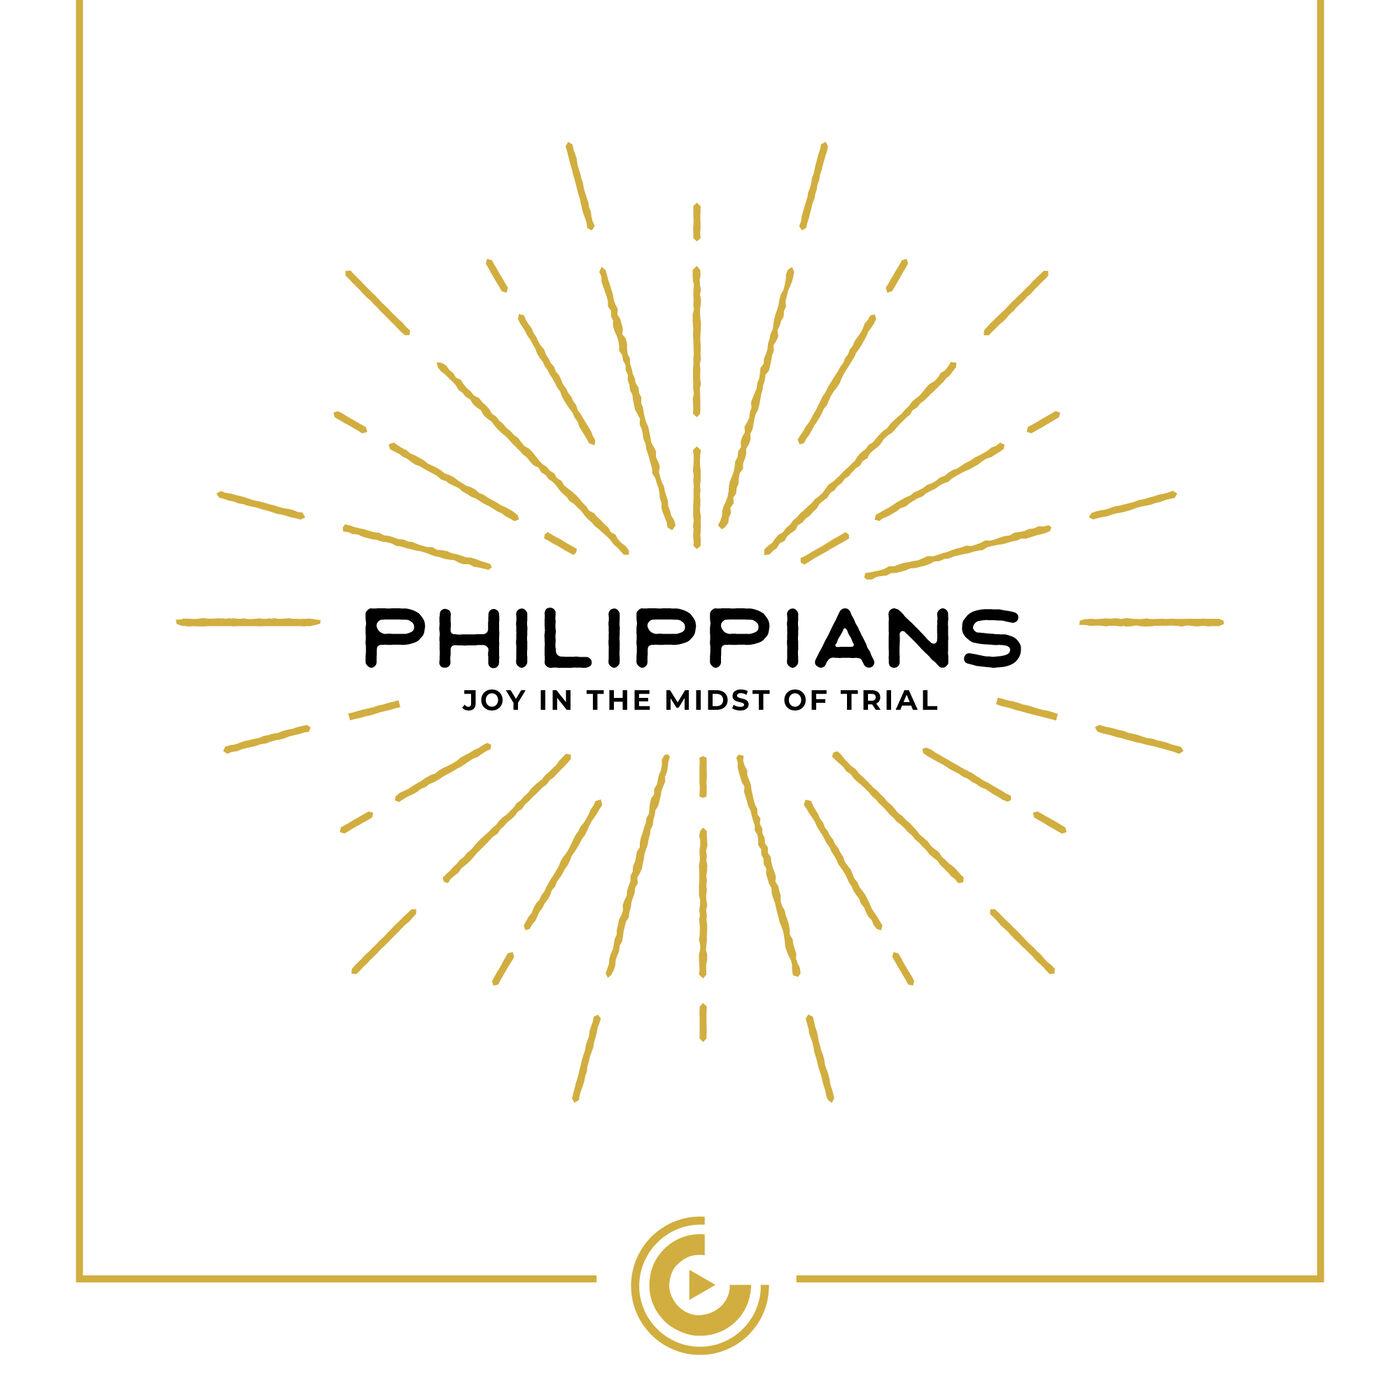 Christ Church Media Bible Study: Philippians 1:11-18